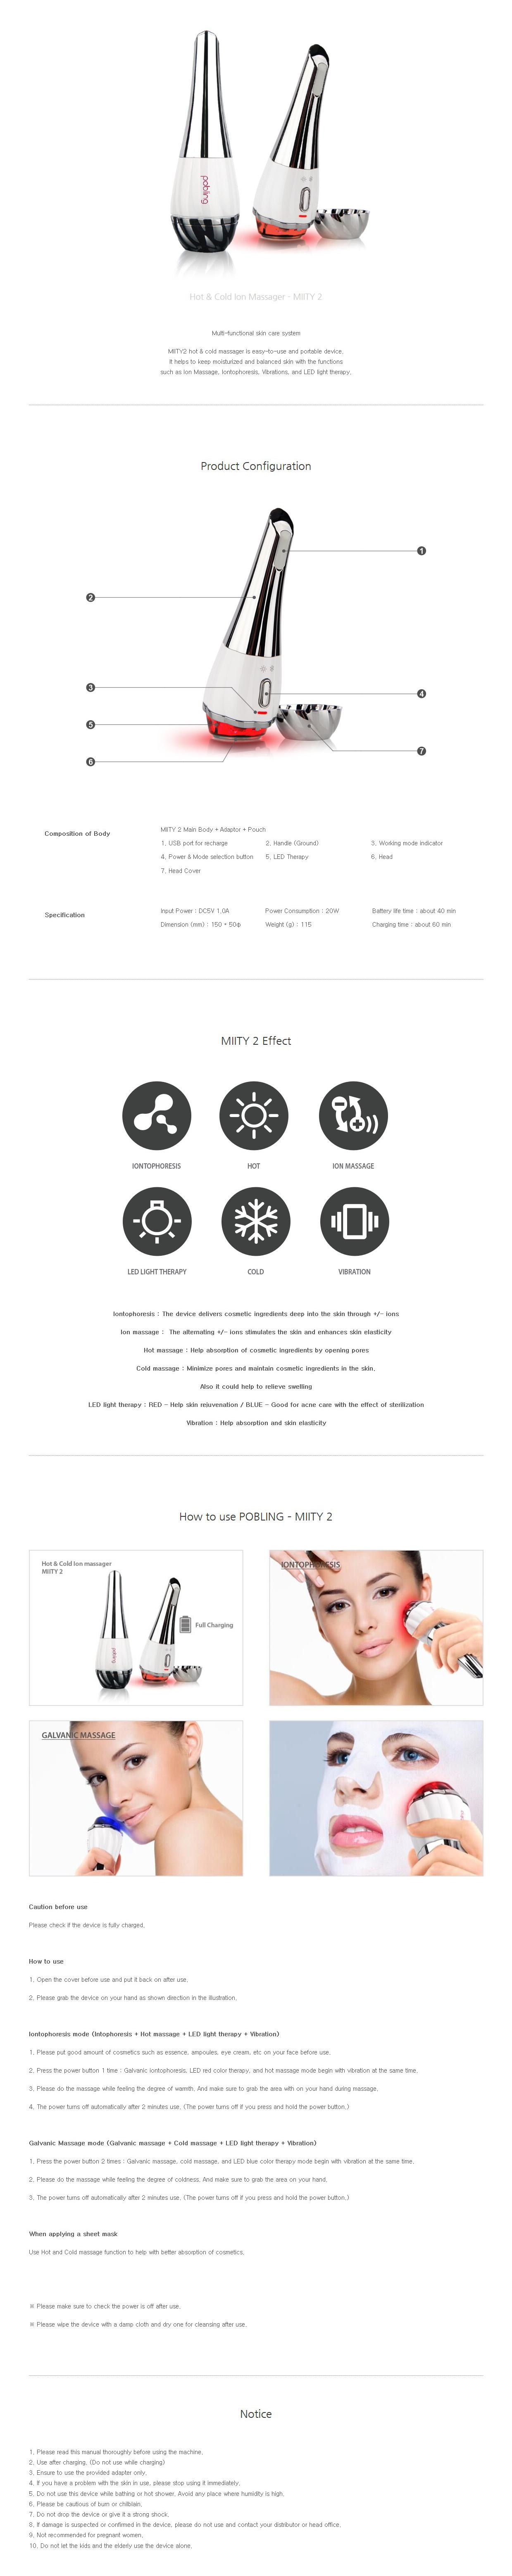 HABALAN Hot & Cold Ion Massager – MIITY 2